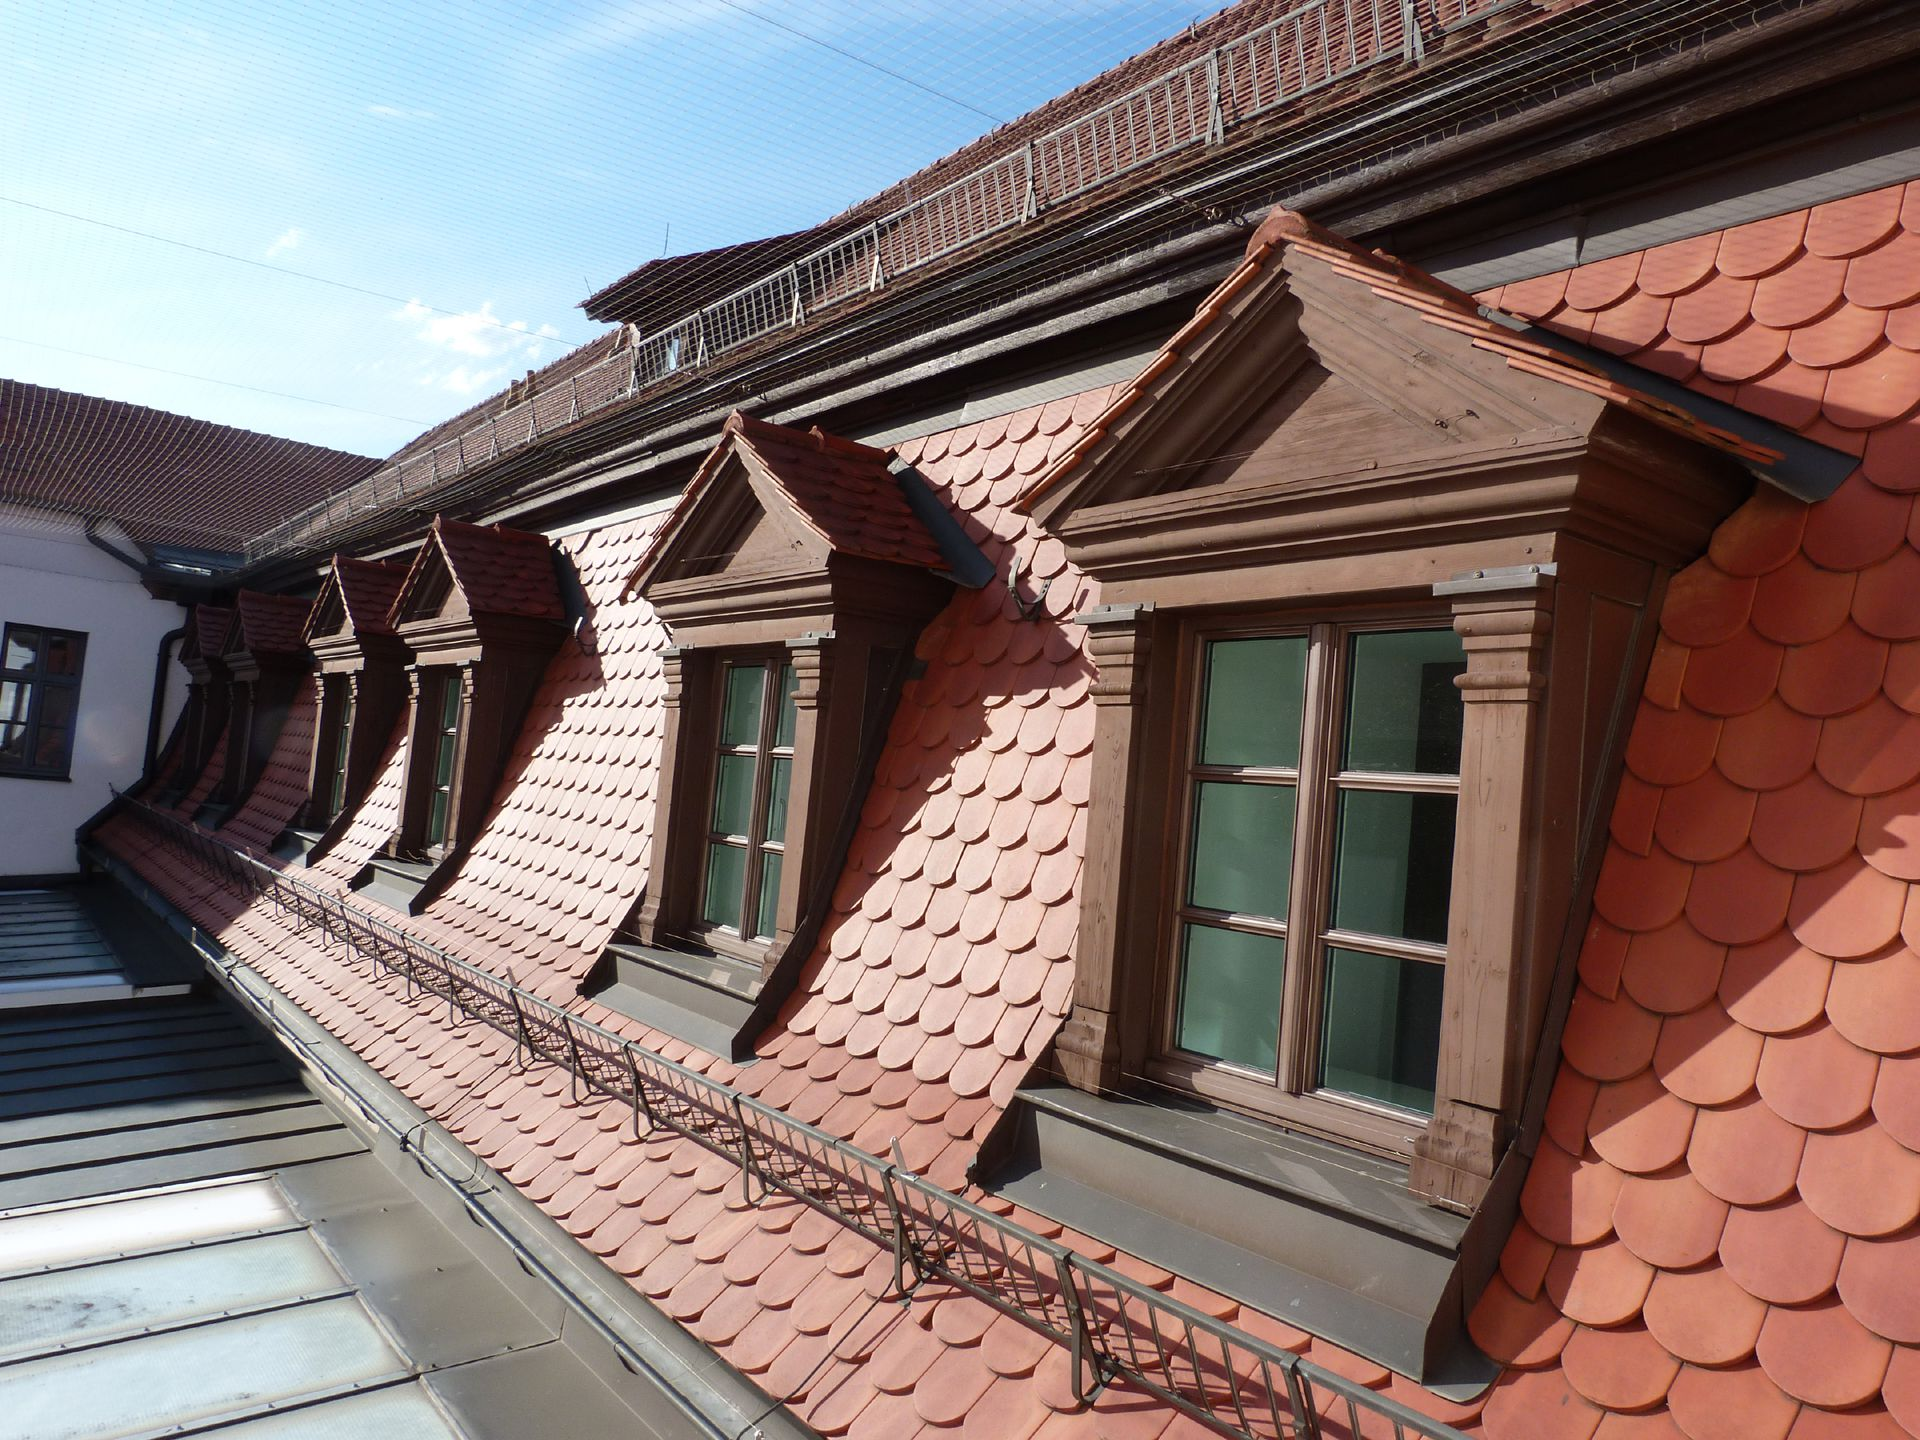 Former Bavarian Trade and Business Institute (Landesgewerbeanstalt) Mansard roof